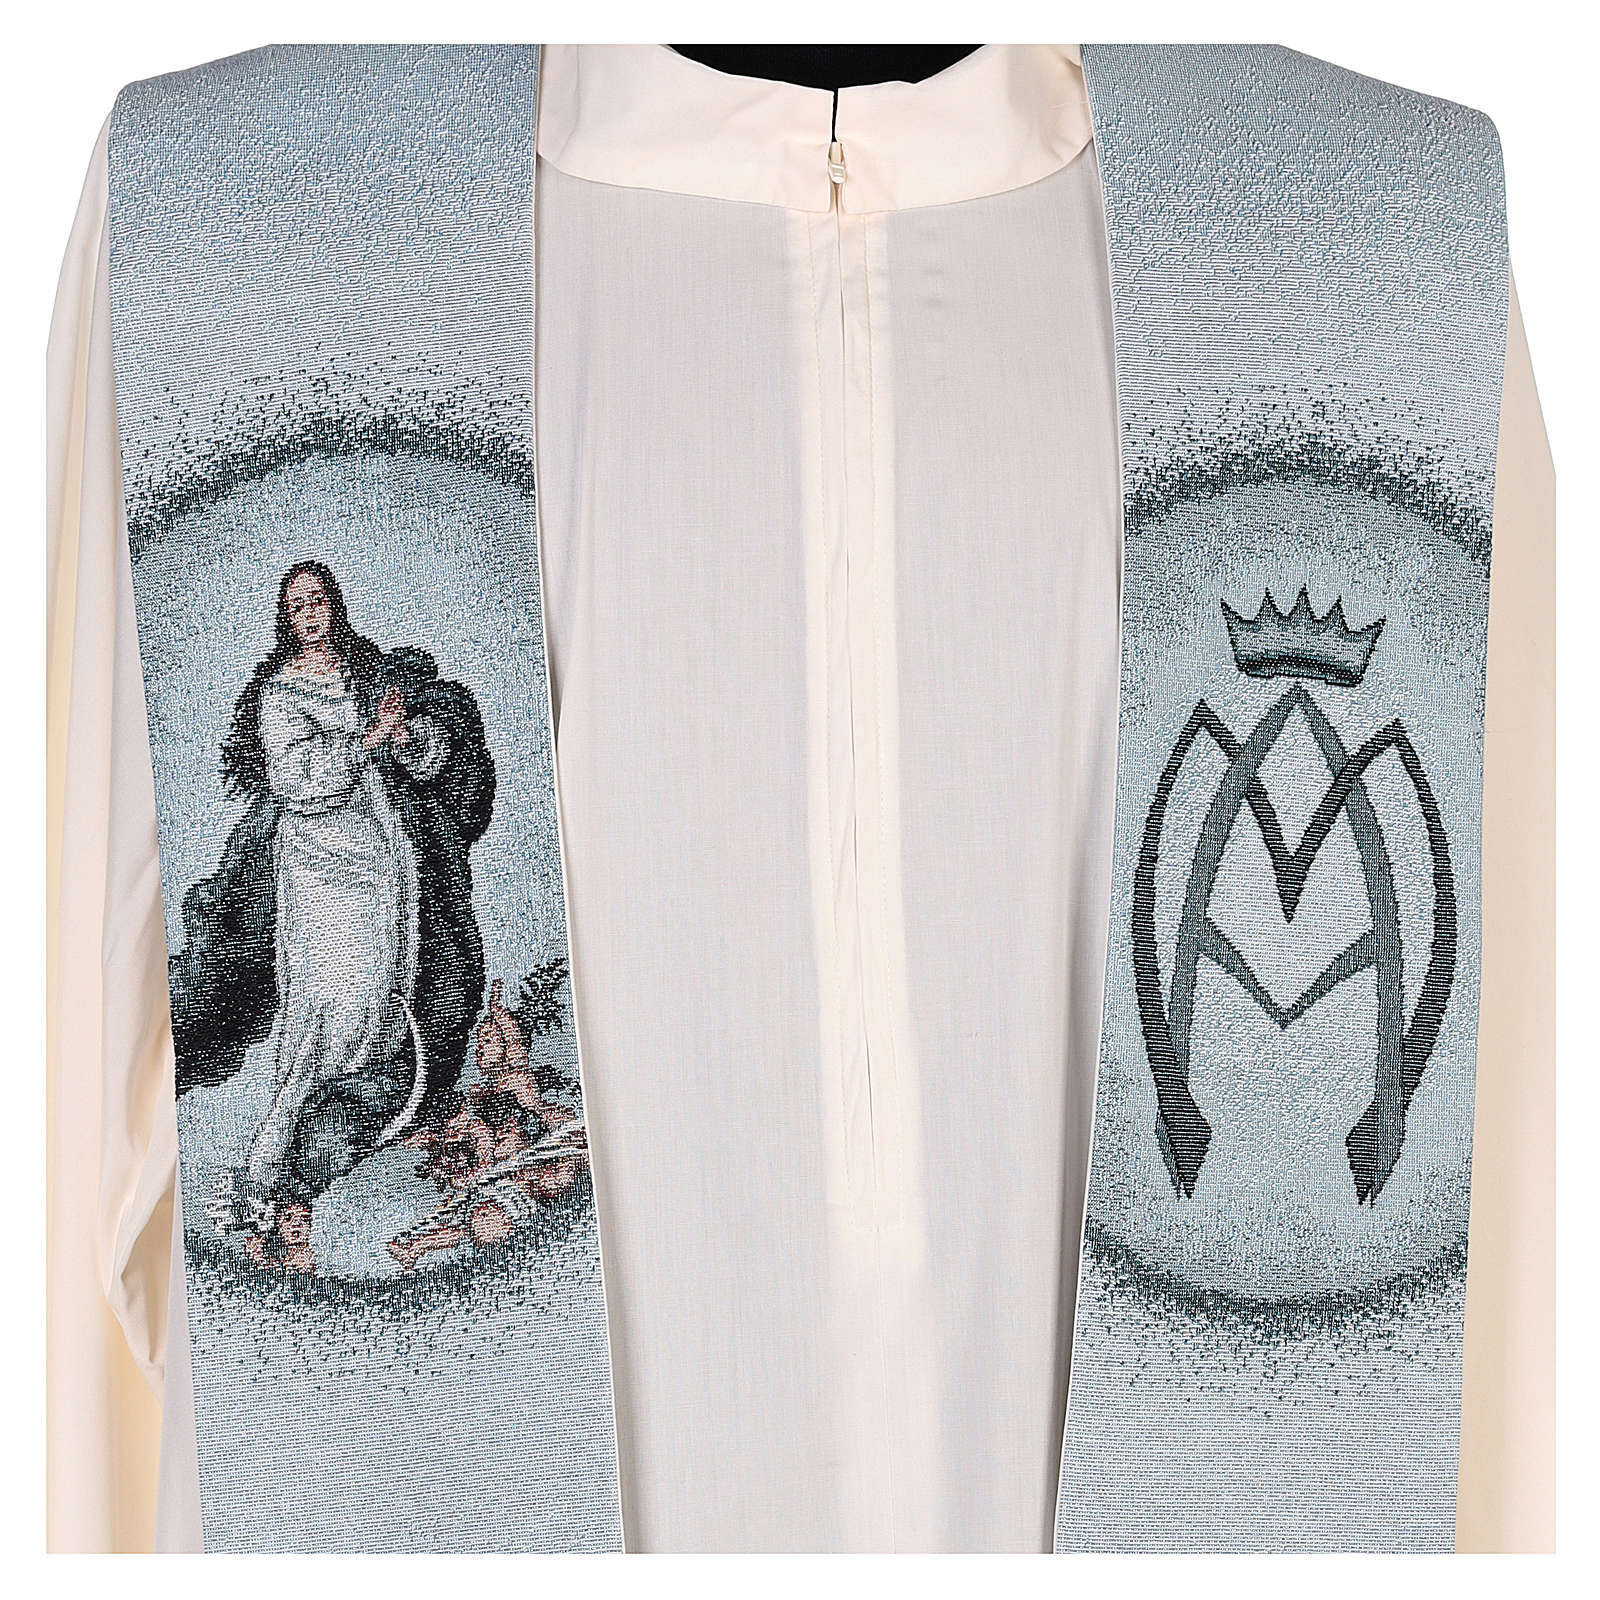 Étole fond bleu Assomption de Marie 4